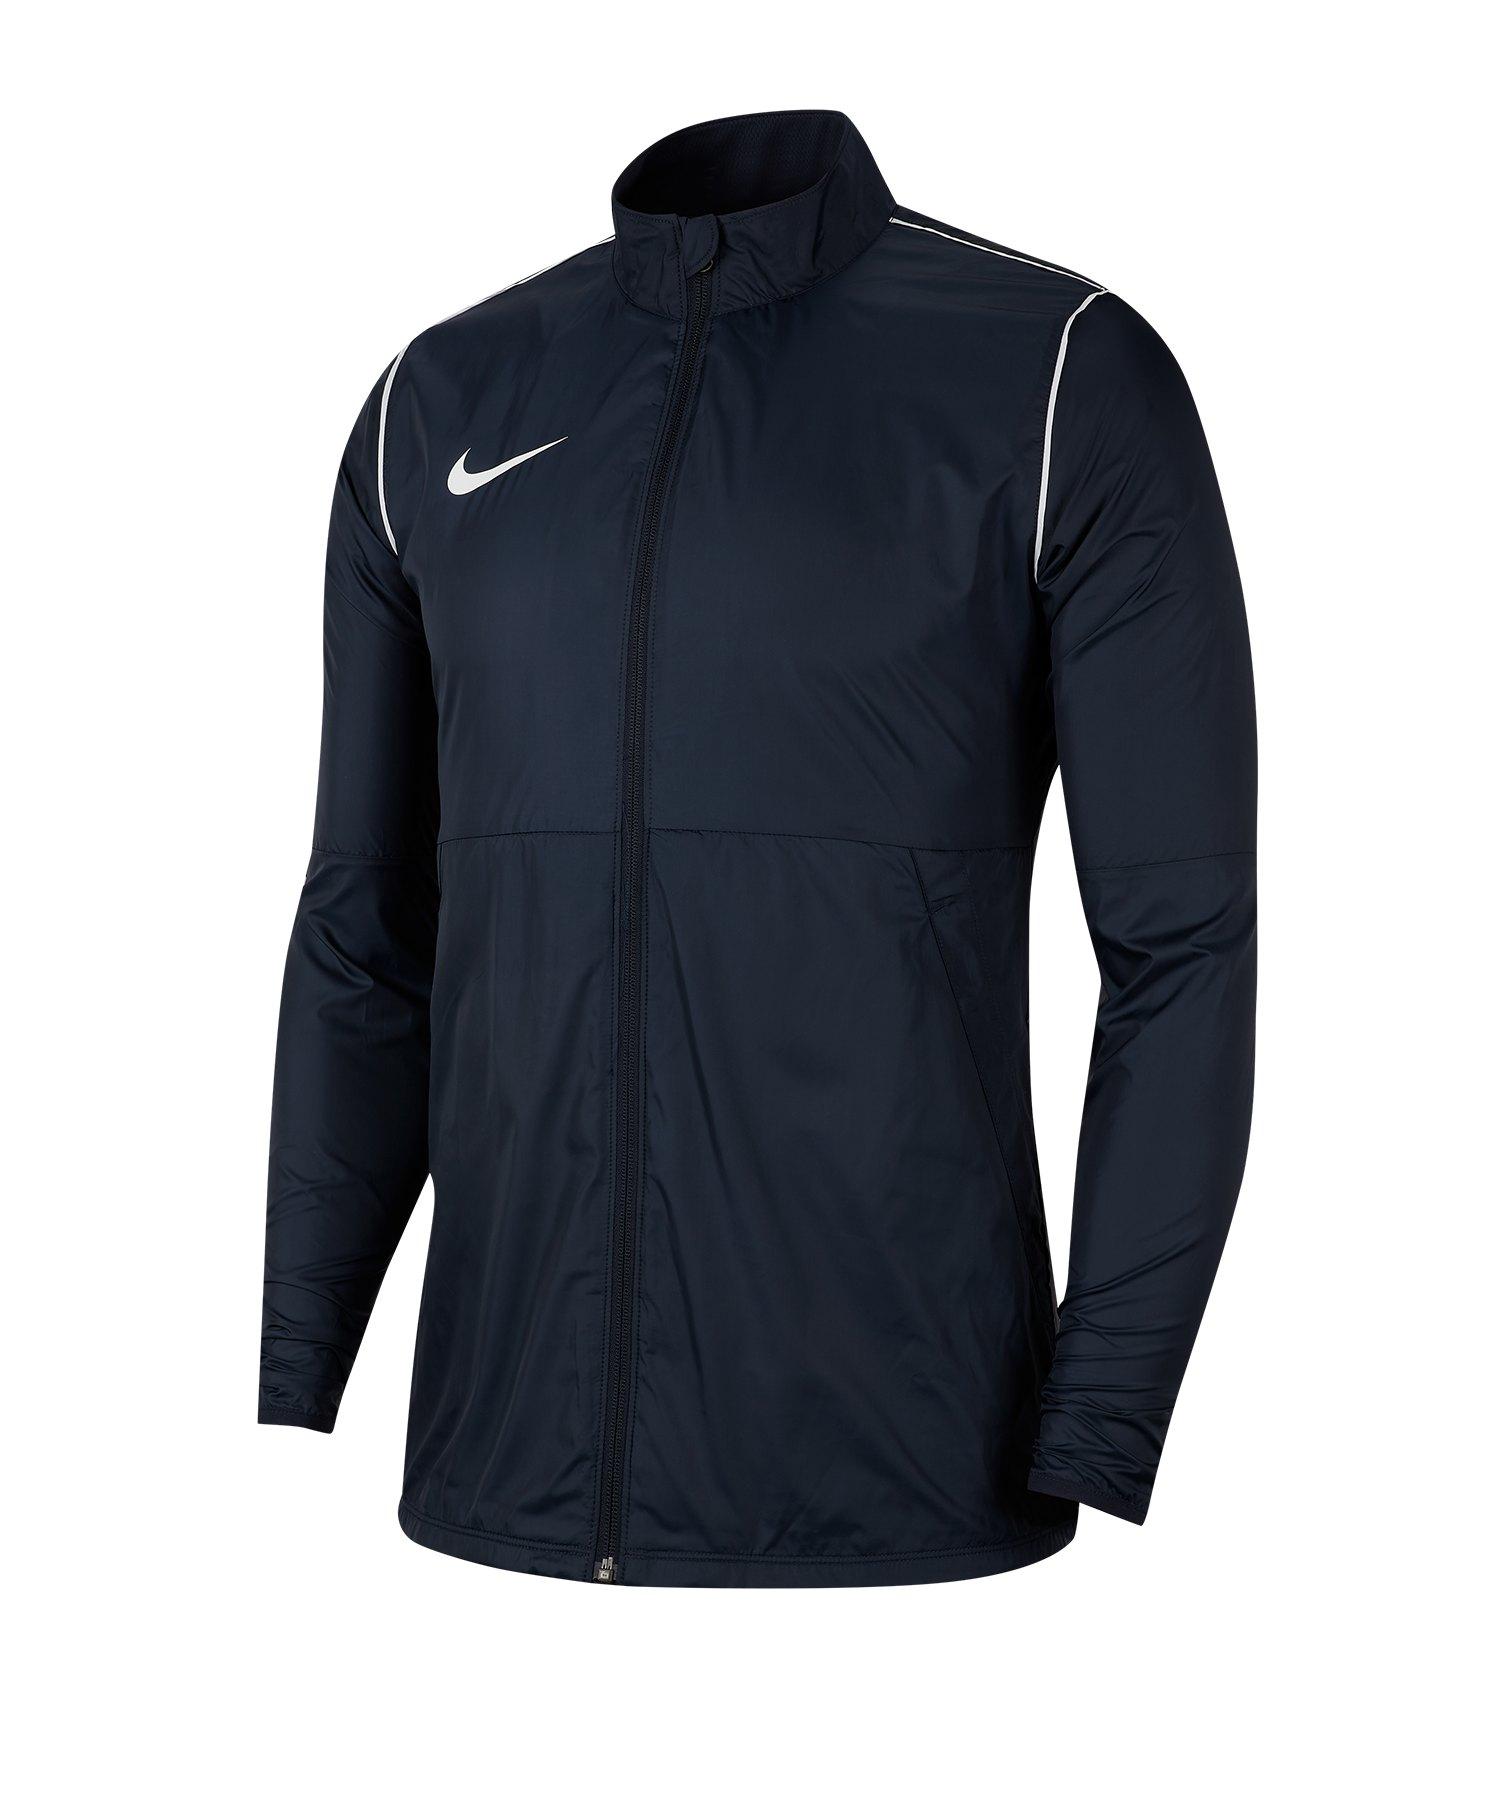 Nike Park 20 Regenjacke Kids Blau F451 - blau